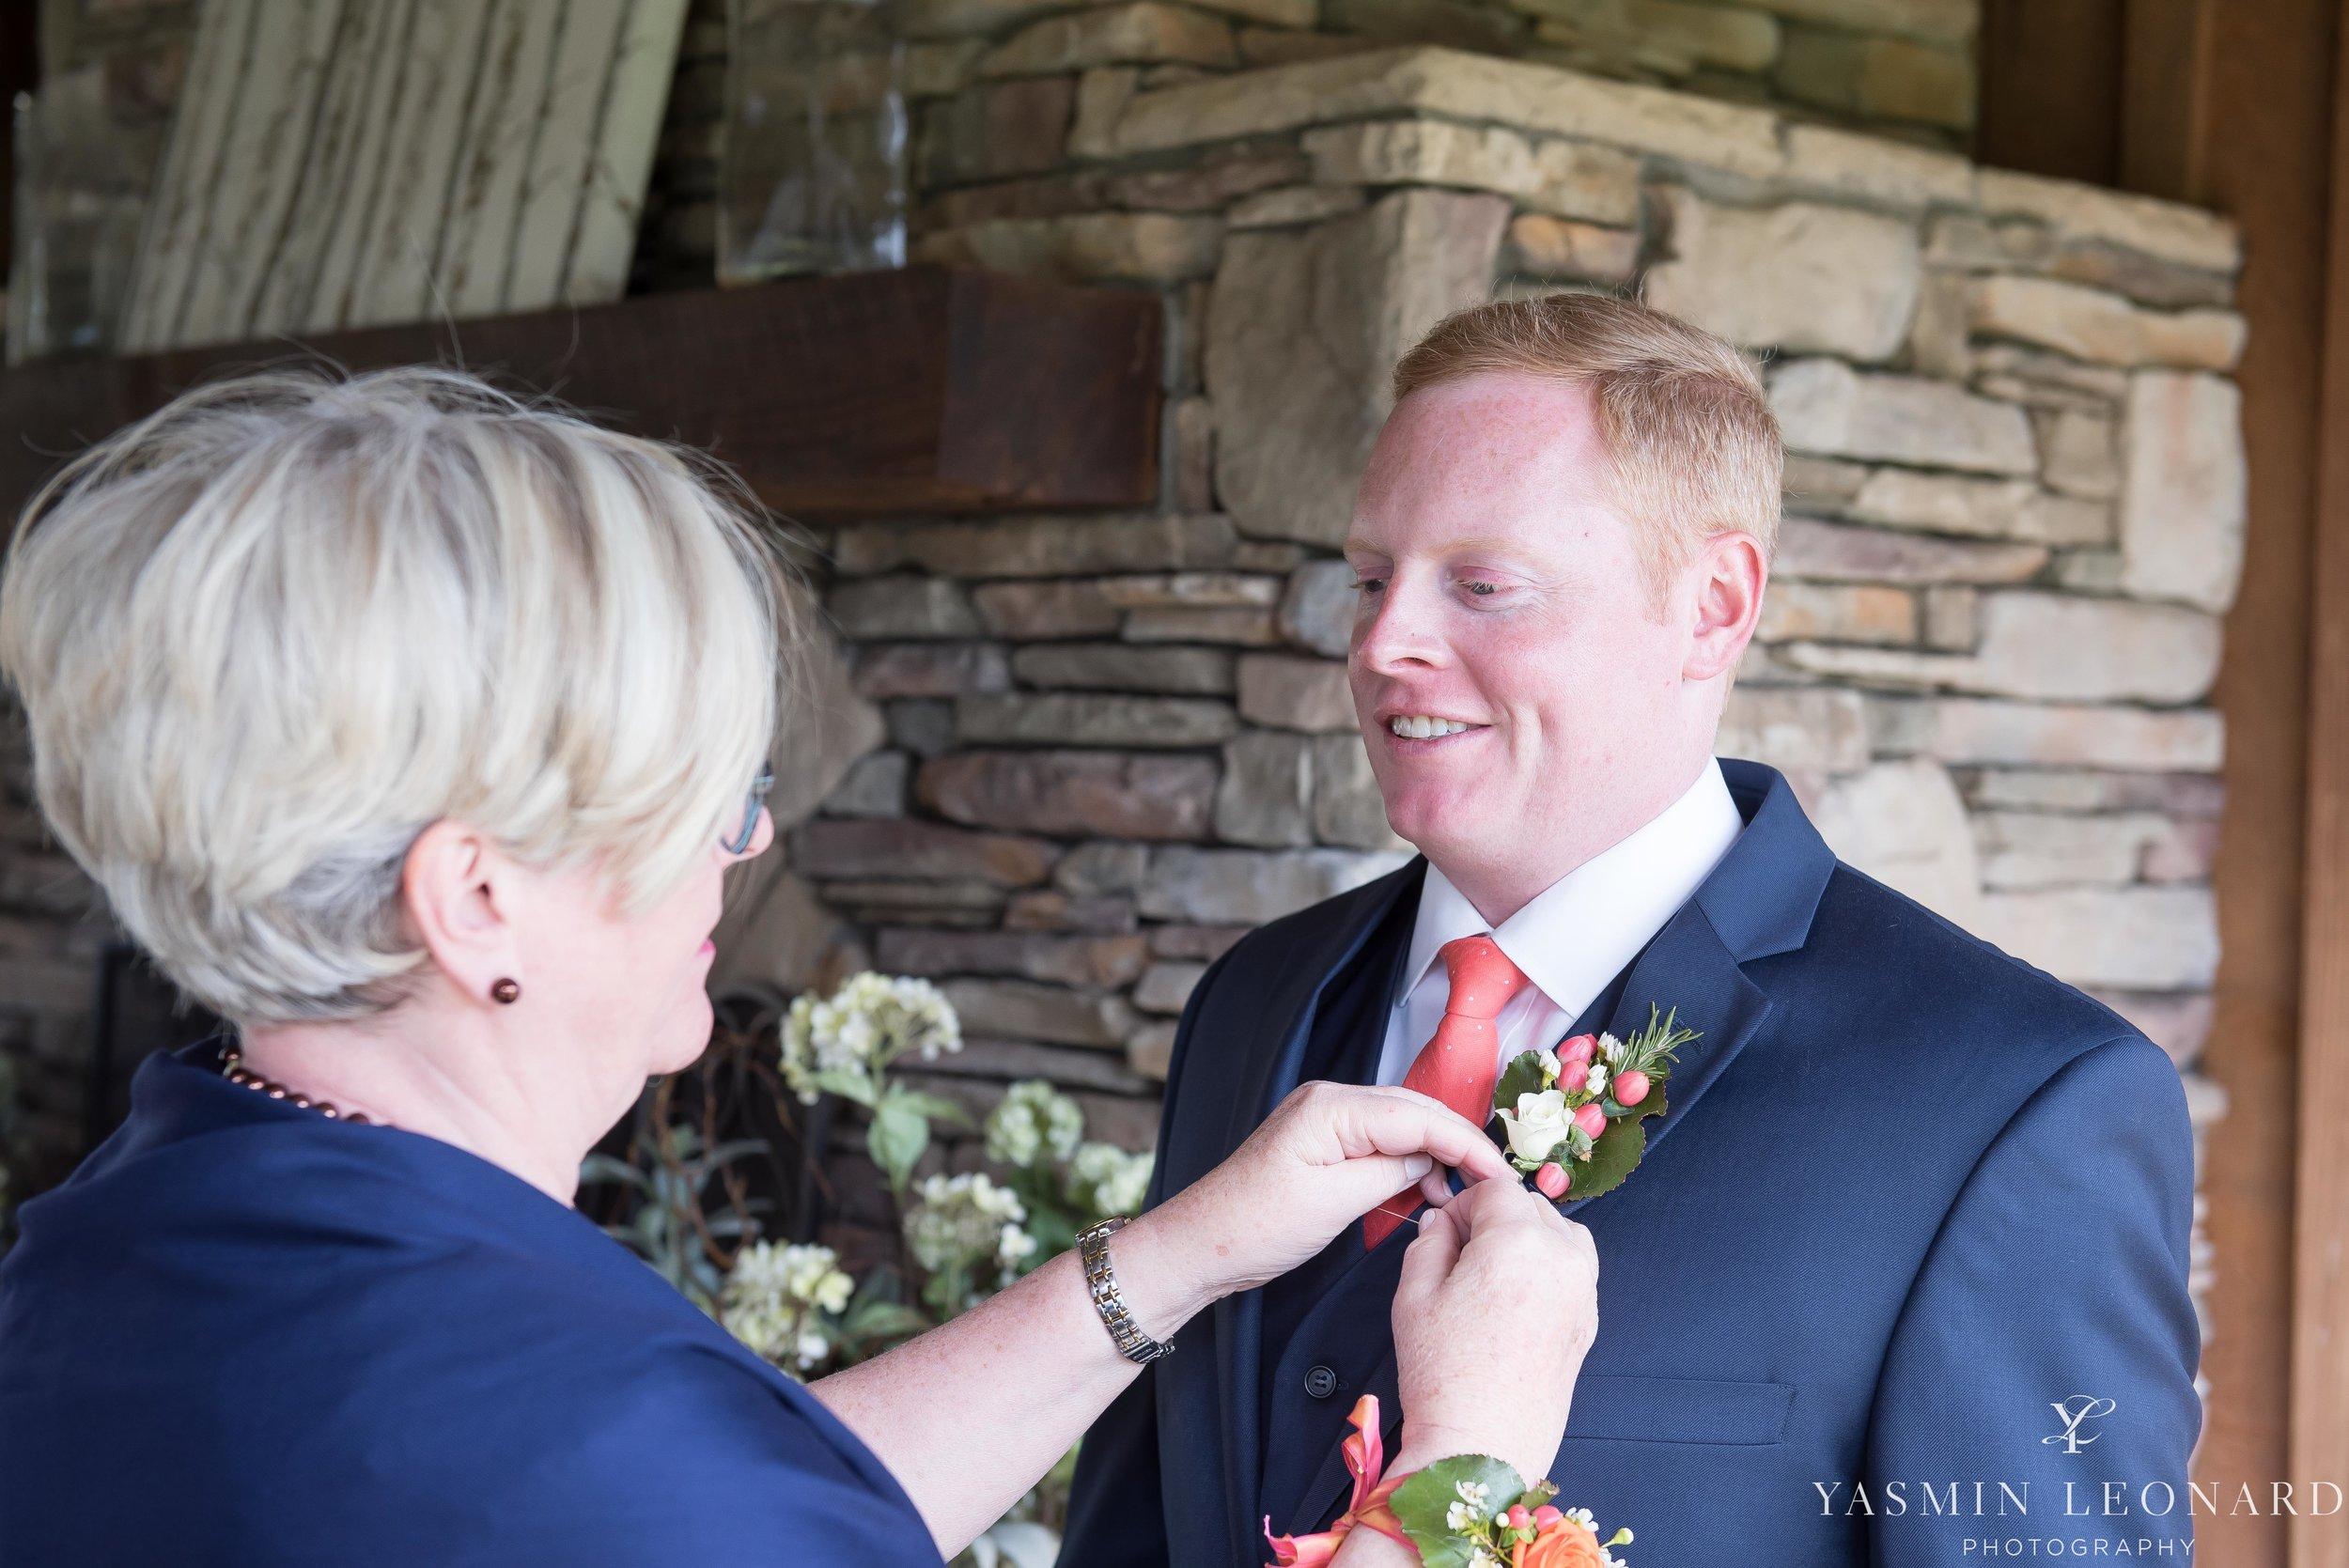 Adaumont Farm - Adaumont Farm Weddings - Trinity Weddings - NC Weddings - Yasmin Leonard Photography-12.jpg